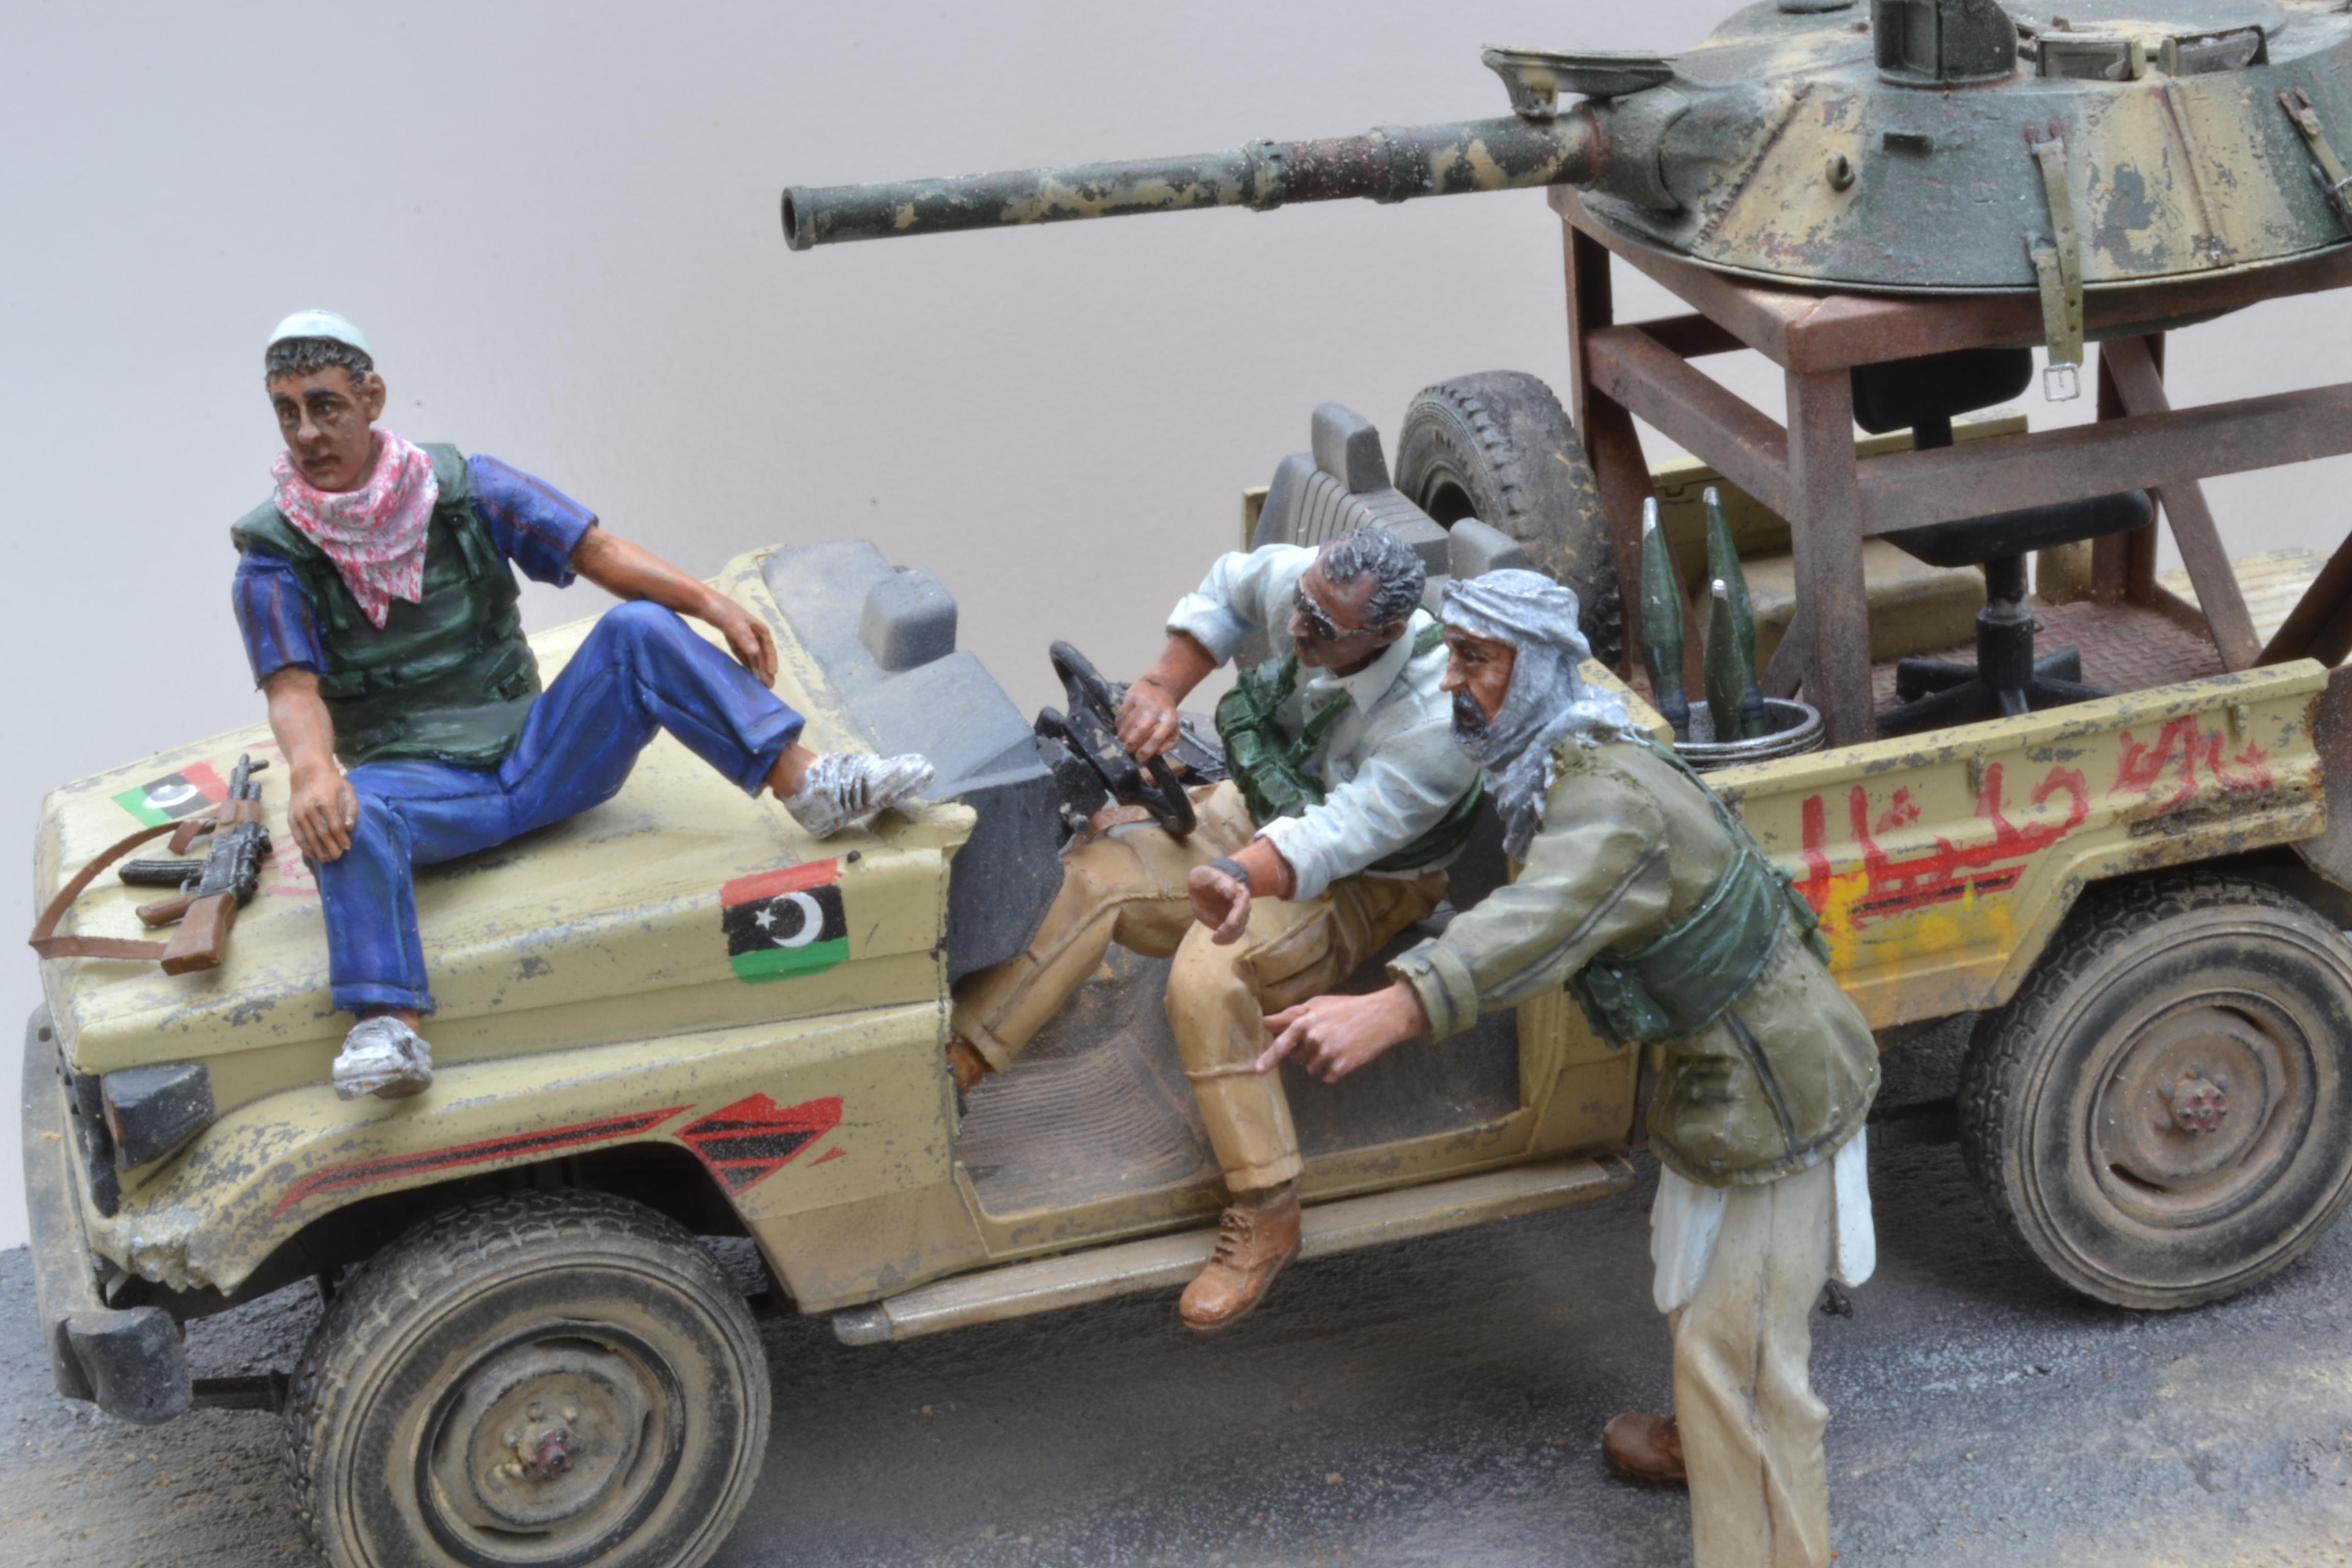 Pick-up (MENG)+tourelle BMP 1/35 (DEF model) - Page 4 16042204024615742614172225